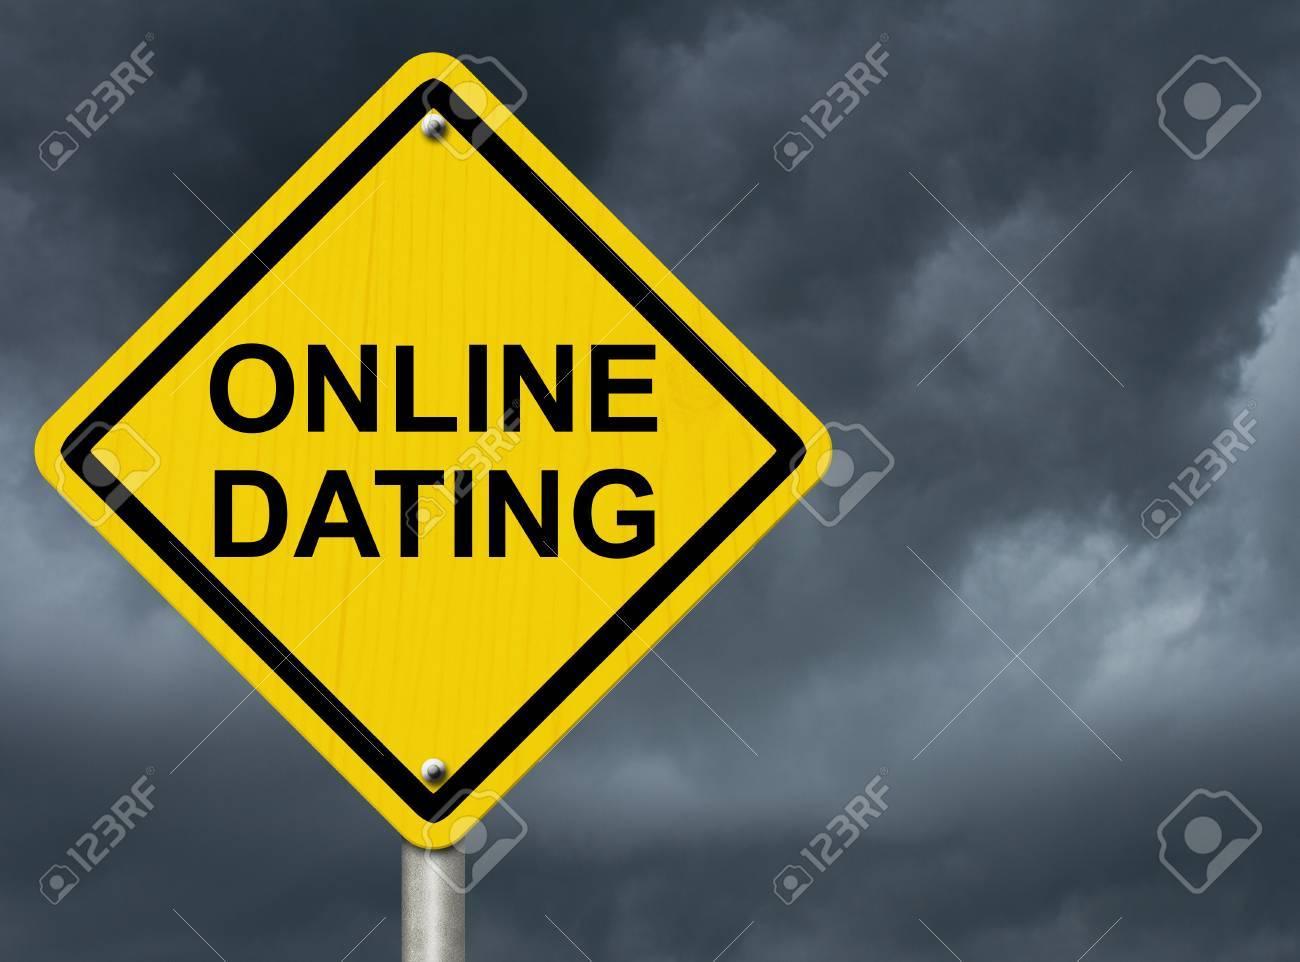 Online-Dating-Traffic